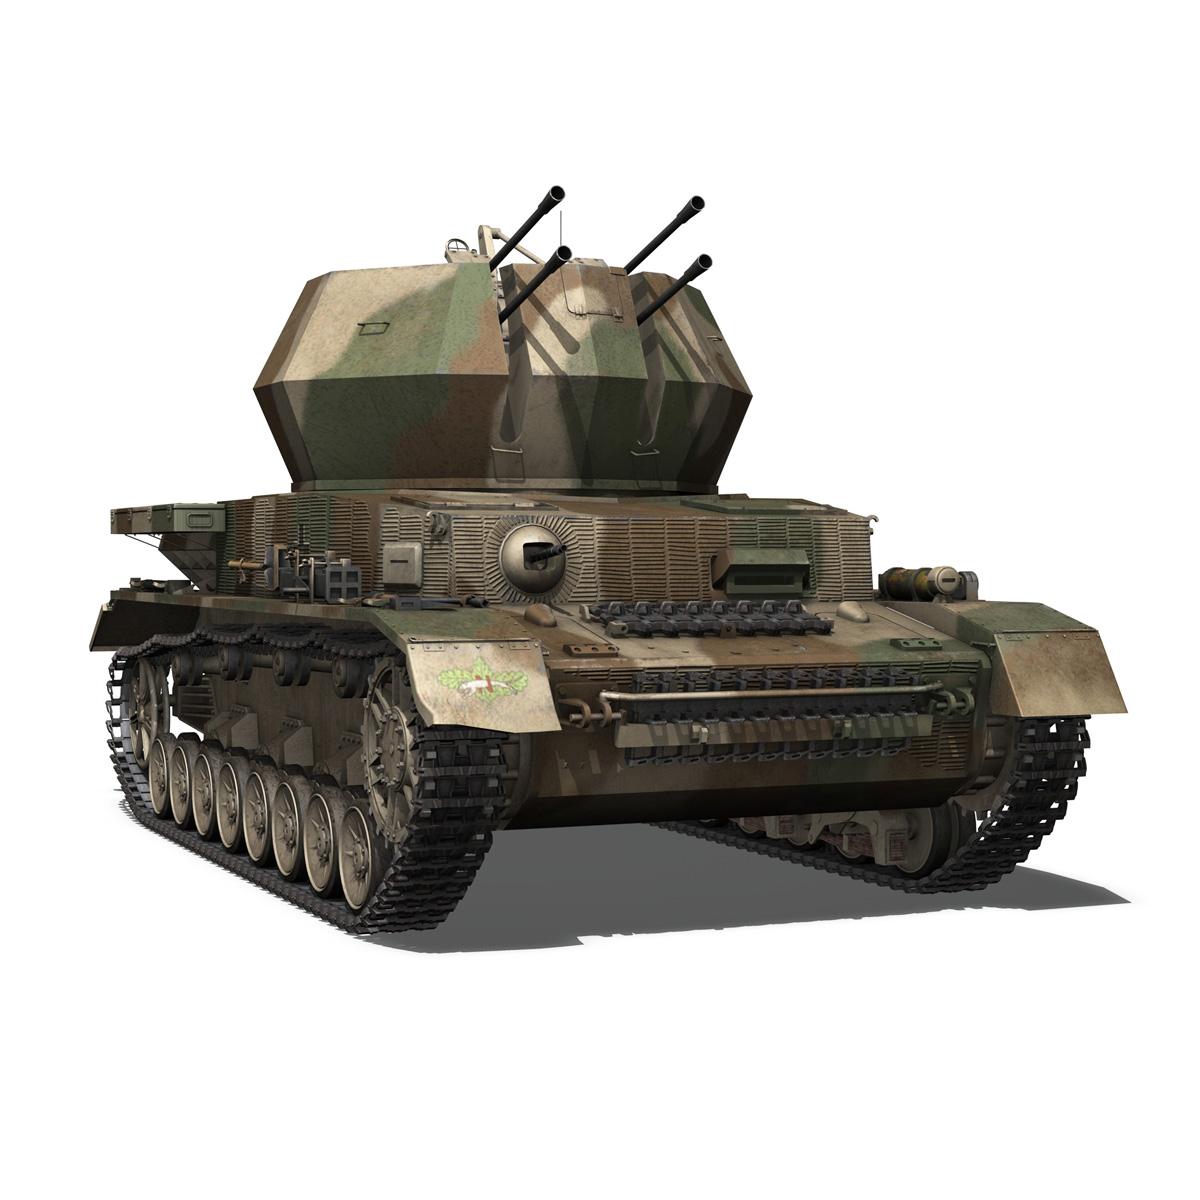 flakpanzer iv – wirbelwind – spzjgabt 654 3d model 3ds fbx c4d lwo obj 282311